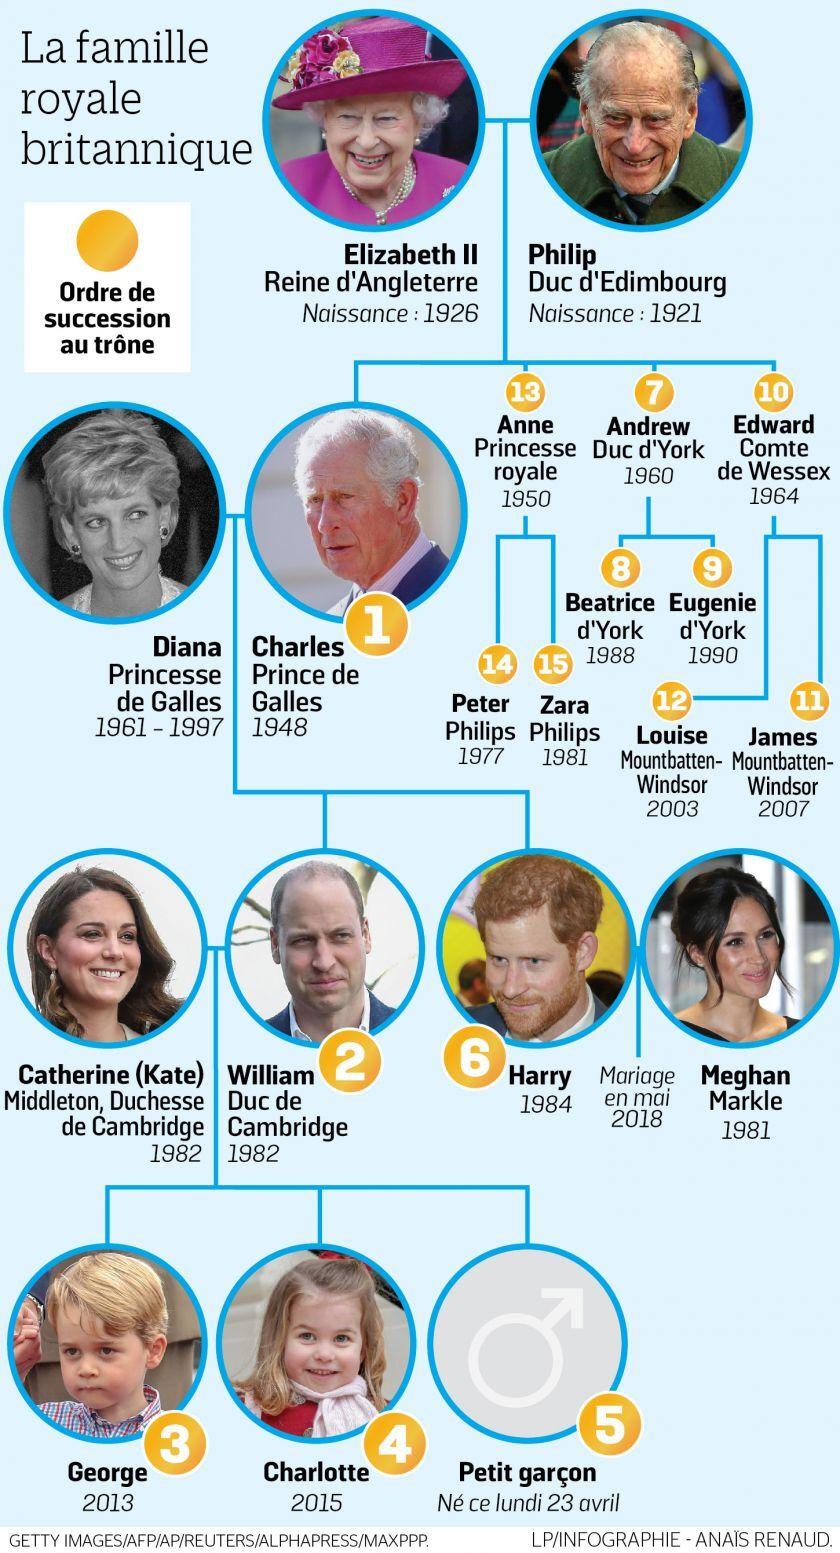 Famille Royale d Angleterre - 1441 Mots | Etudier